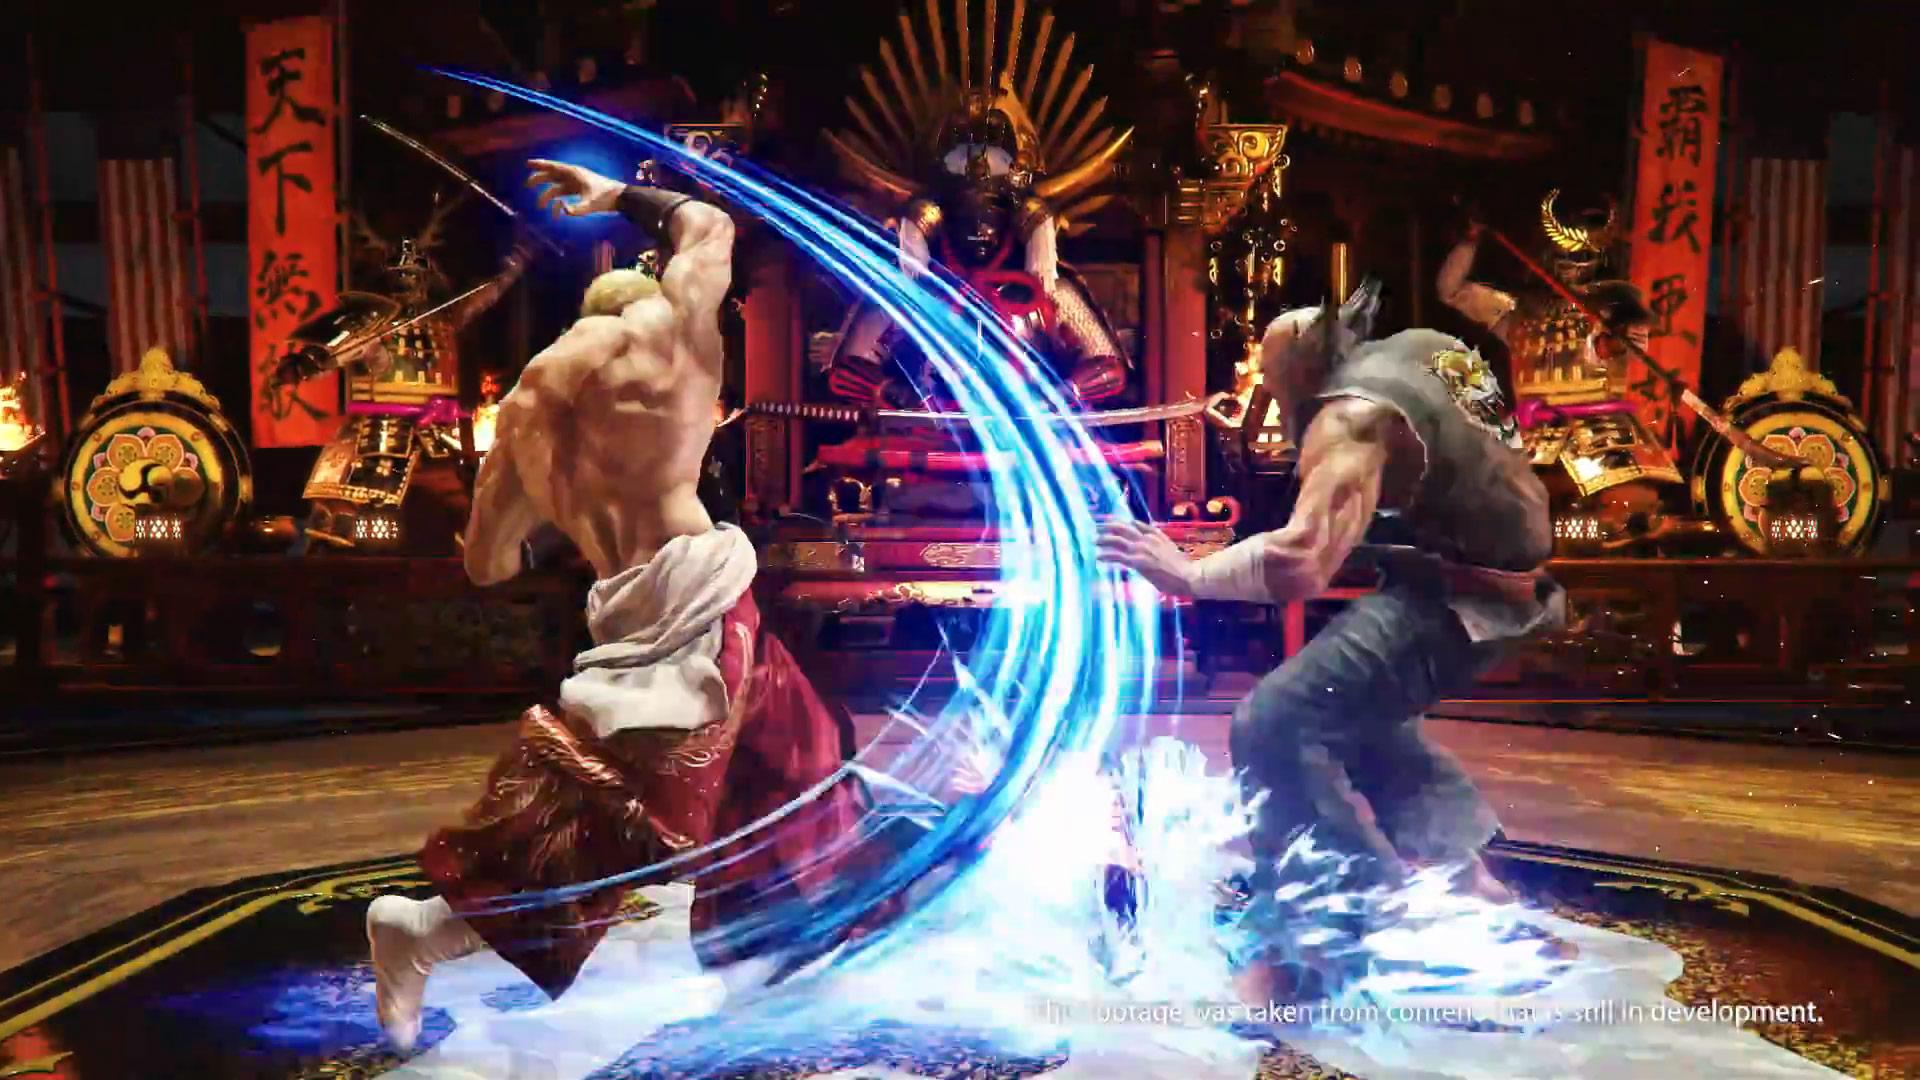 Geese Howard Tekken 7 screen shots 7 out of 9 image gallery